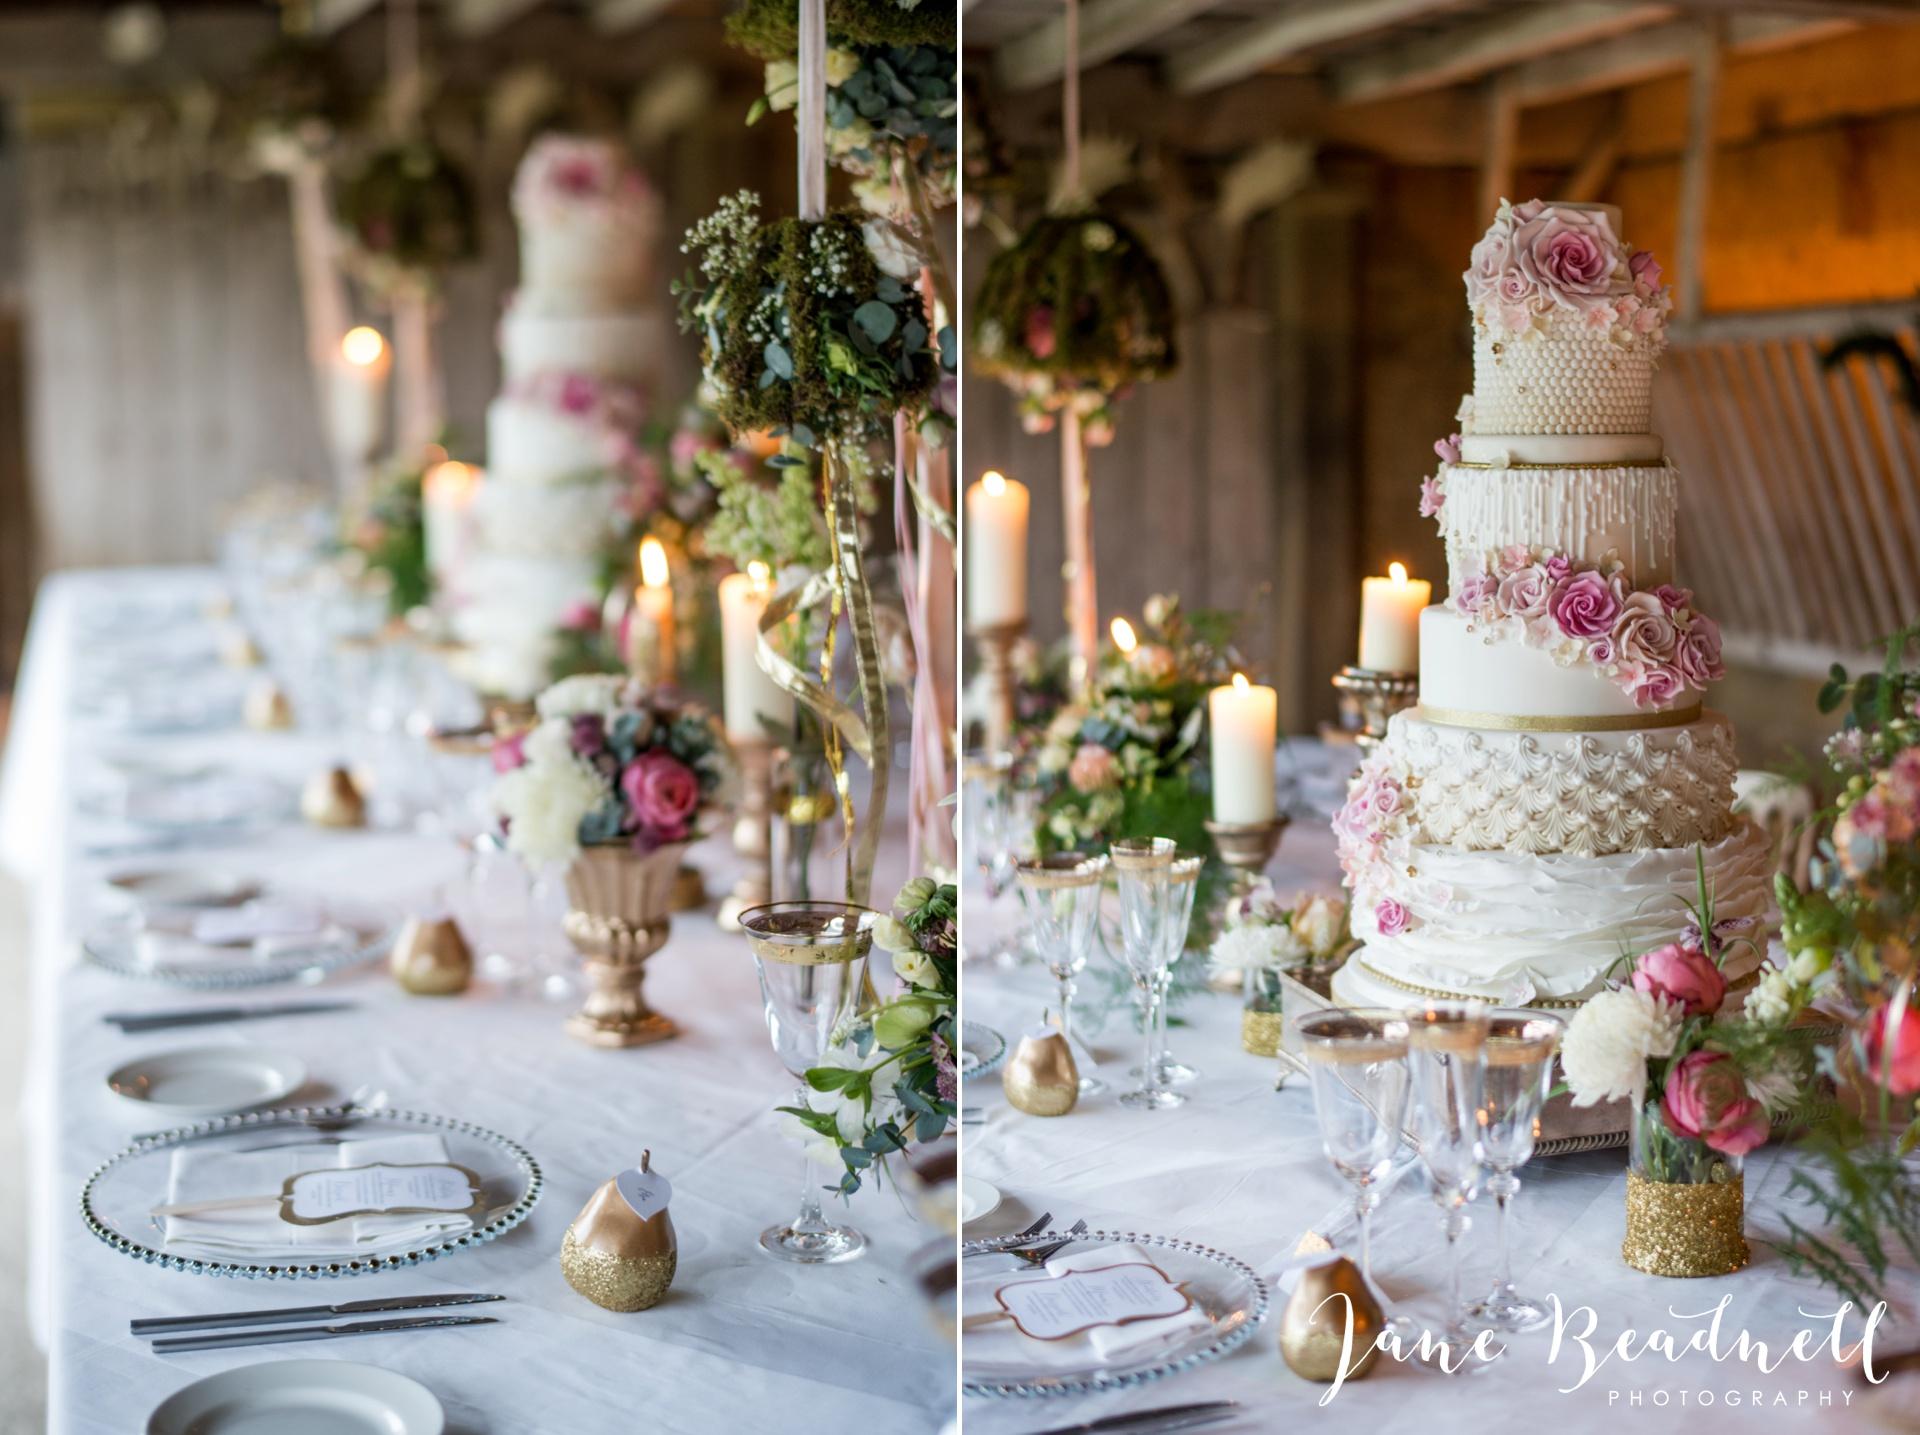 Jane Beadnell fine art wedding photographer Swinton Park1